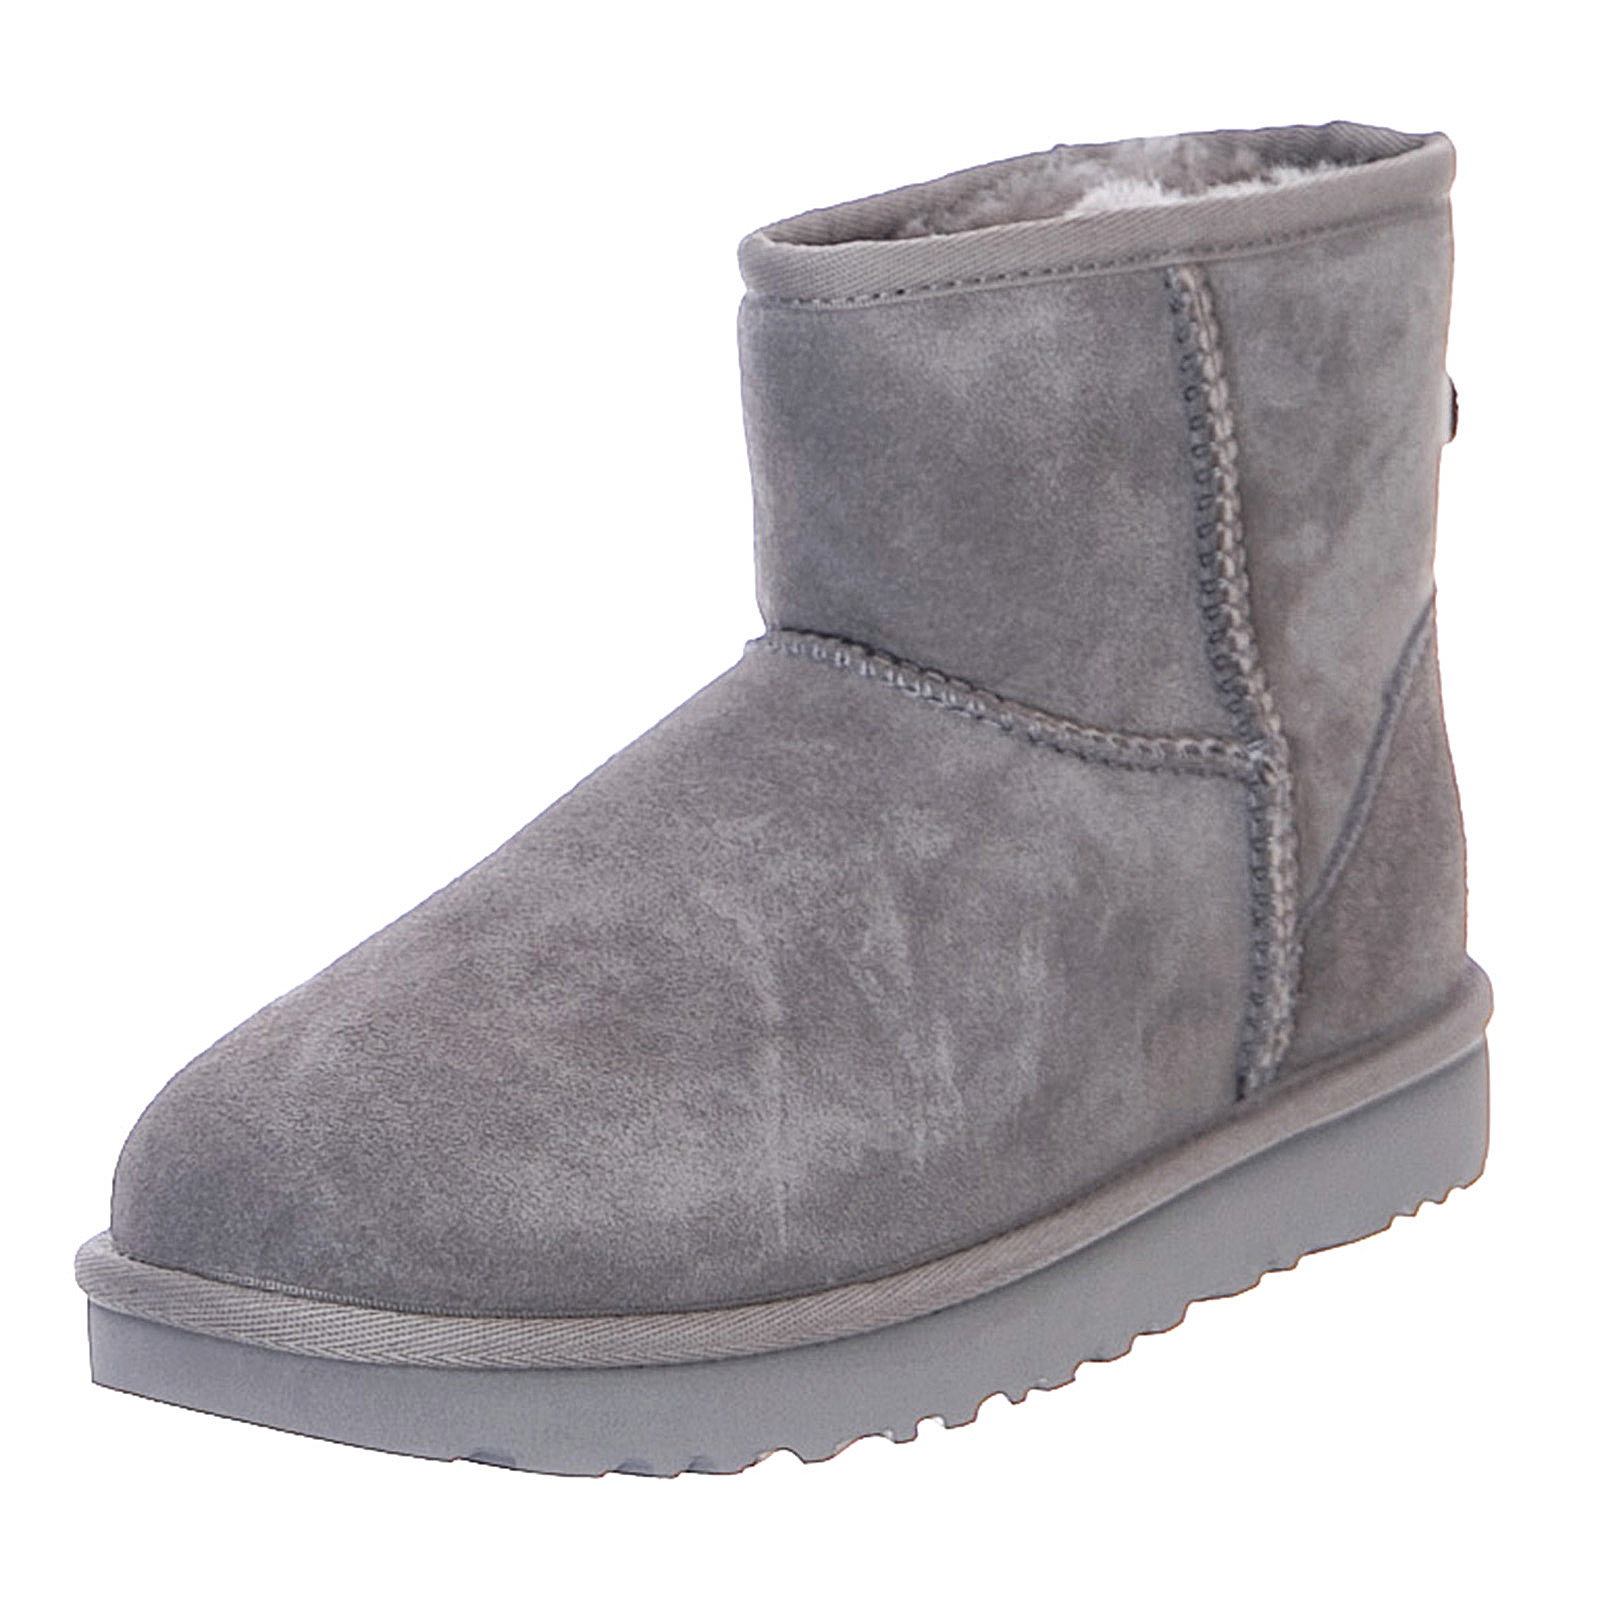 Mini Donna Classic Boot Ii Ugg Grey Stivali GrigioEbay QshtrdC